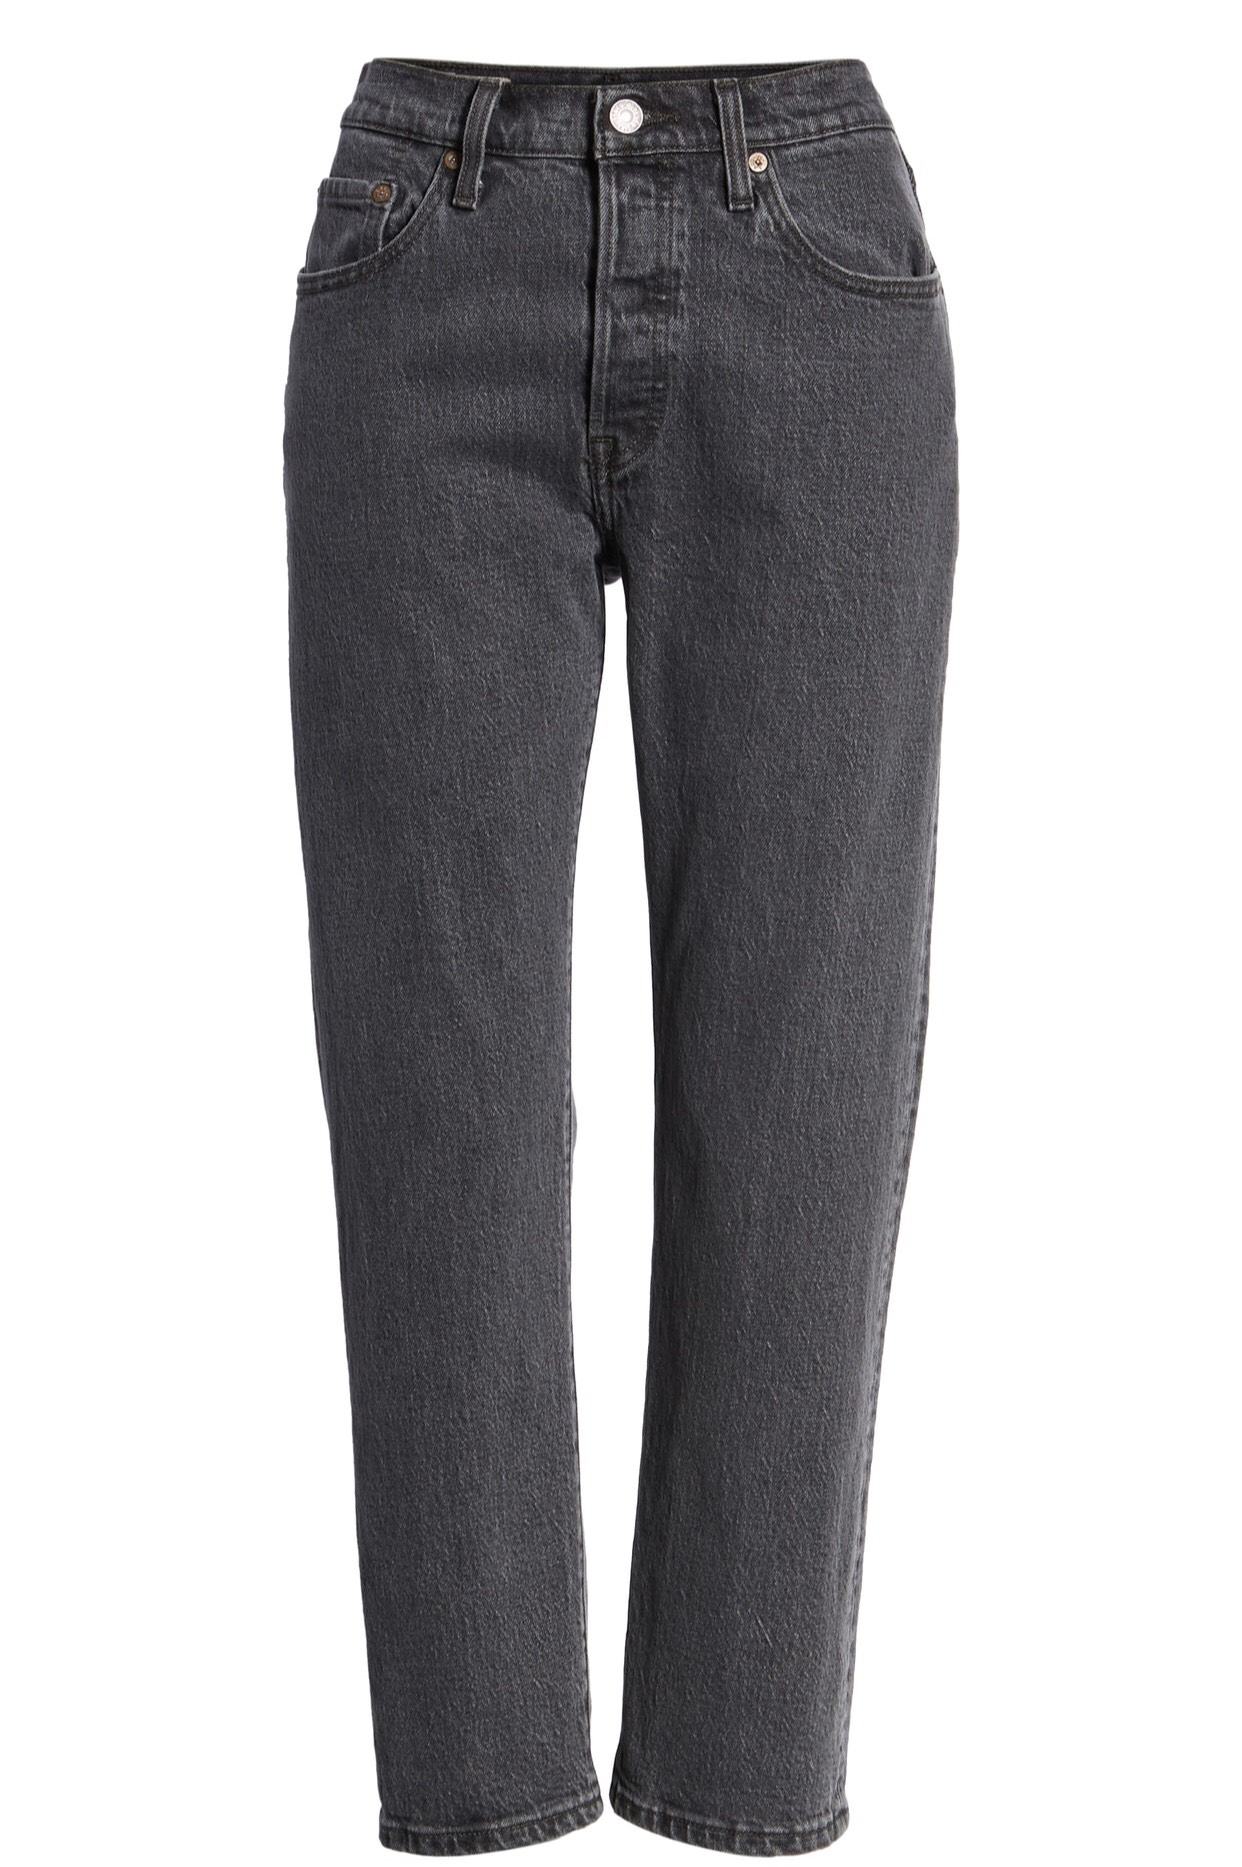 Levi's 501 Crop Skinny Jeans {$64.90} - After sale: $98